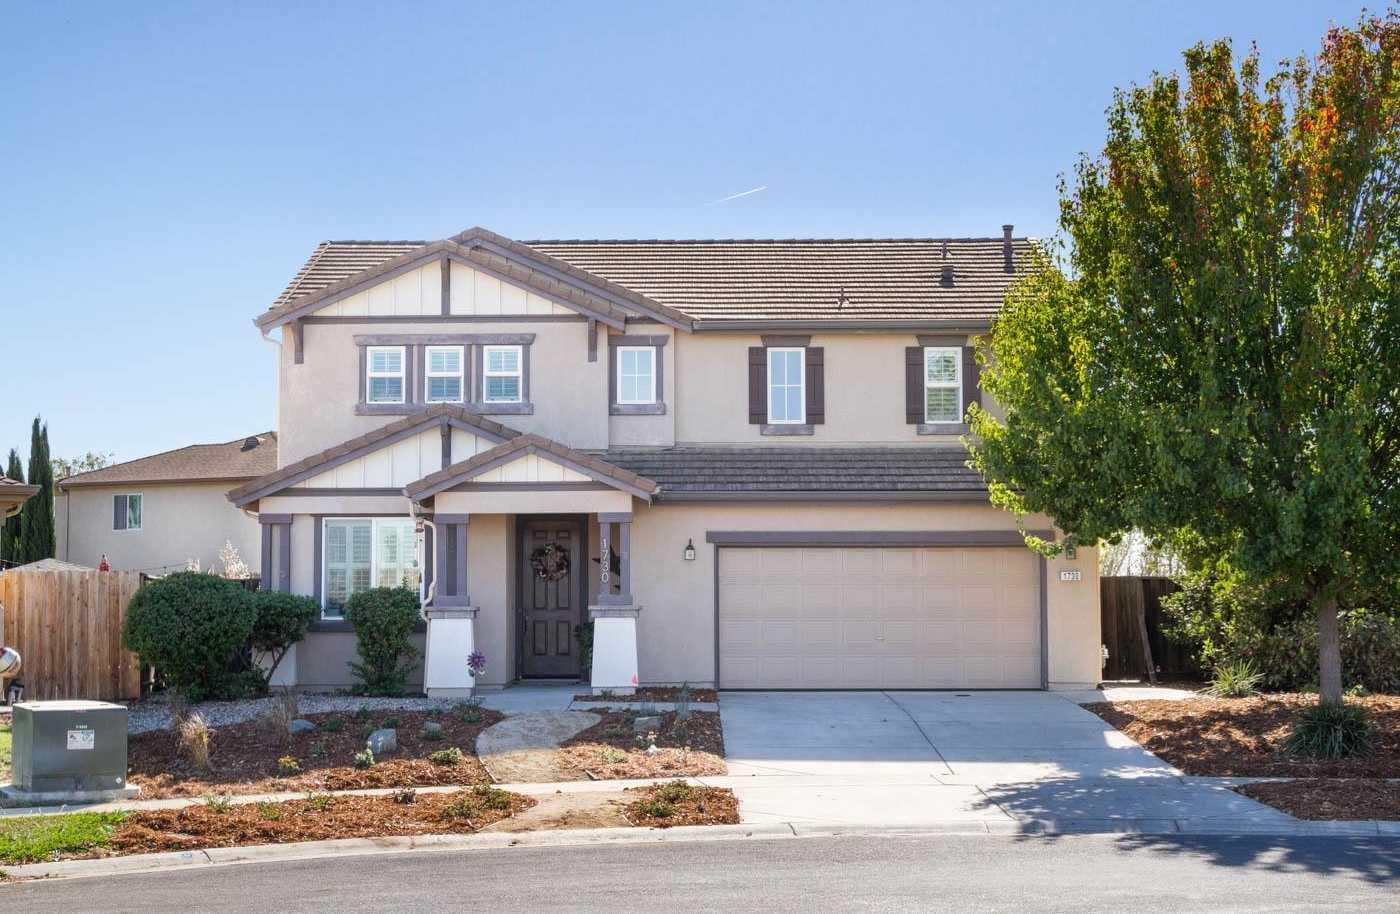 1730 Brianna Ave Olivehurst, CA 95961